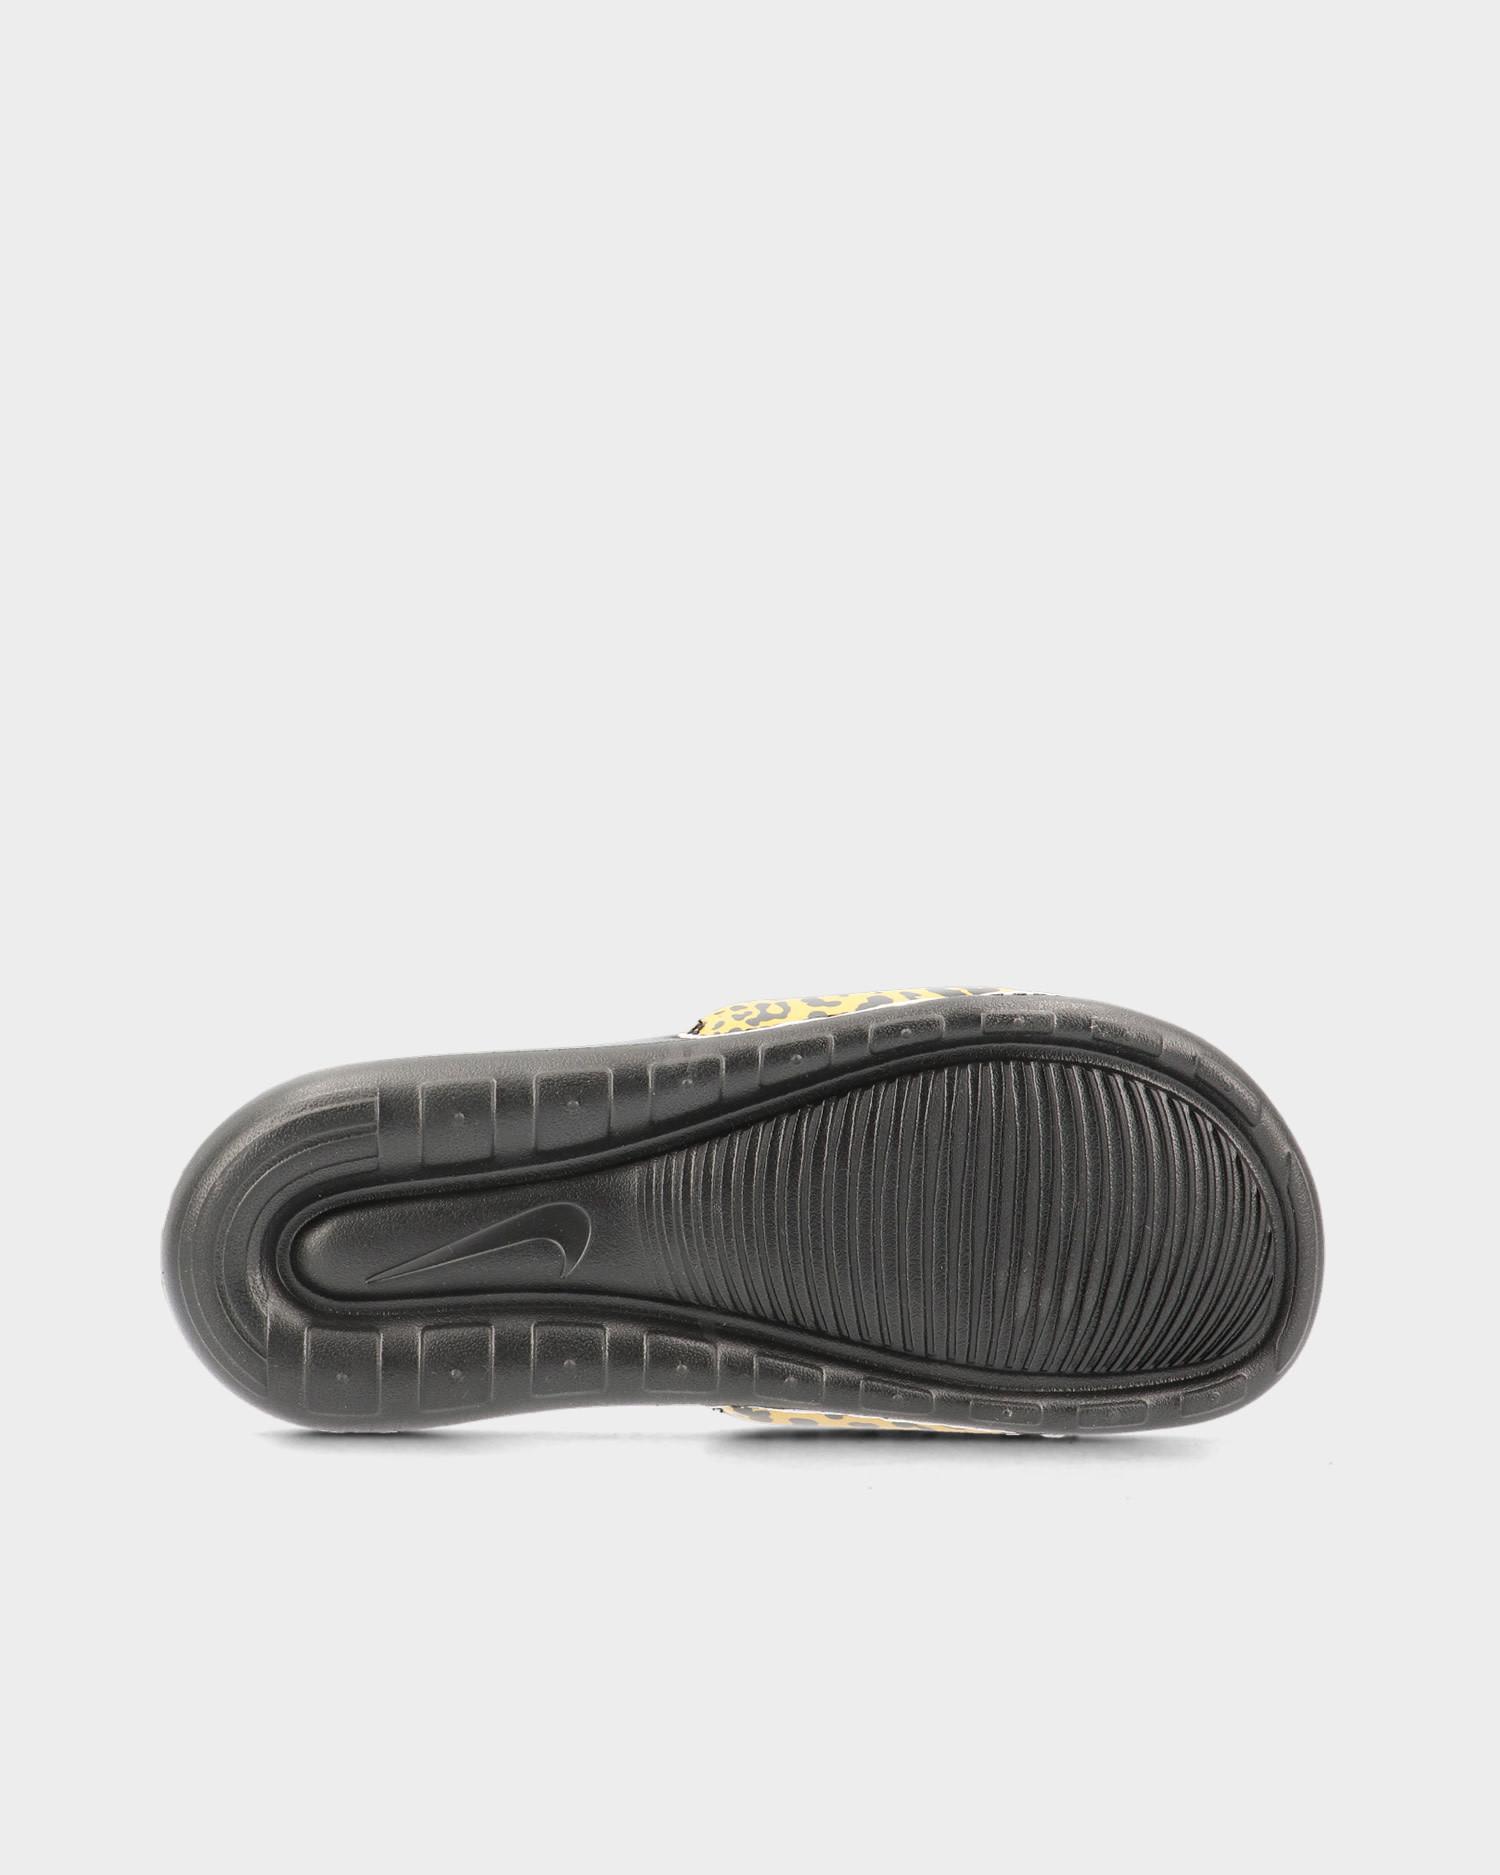 Nike Wmns Victori One Slide Chutney/White-Black